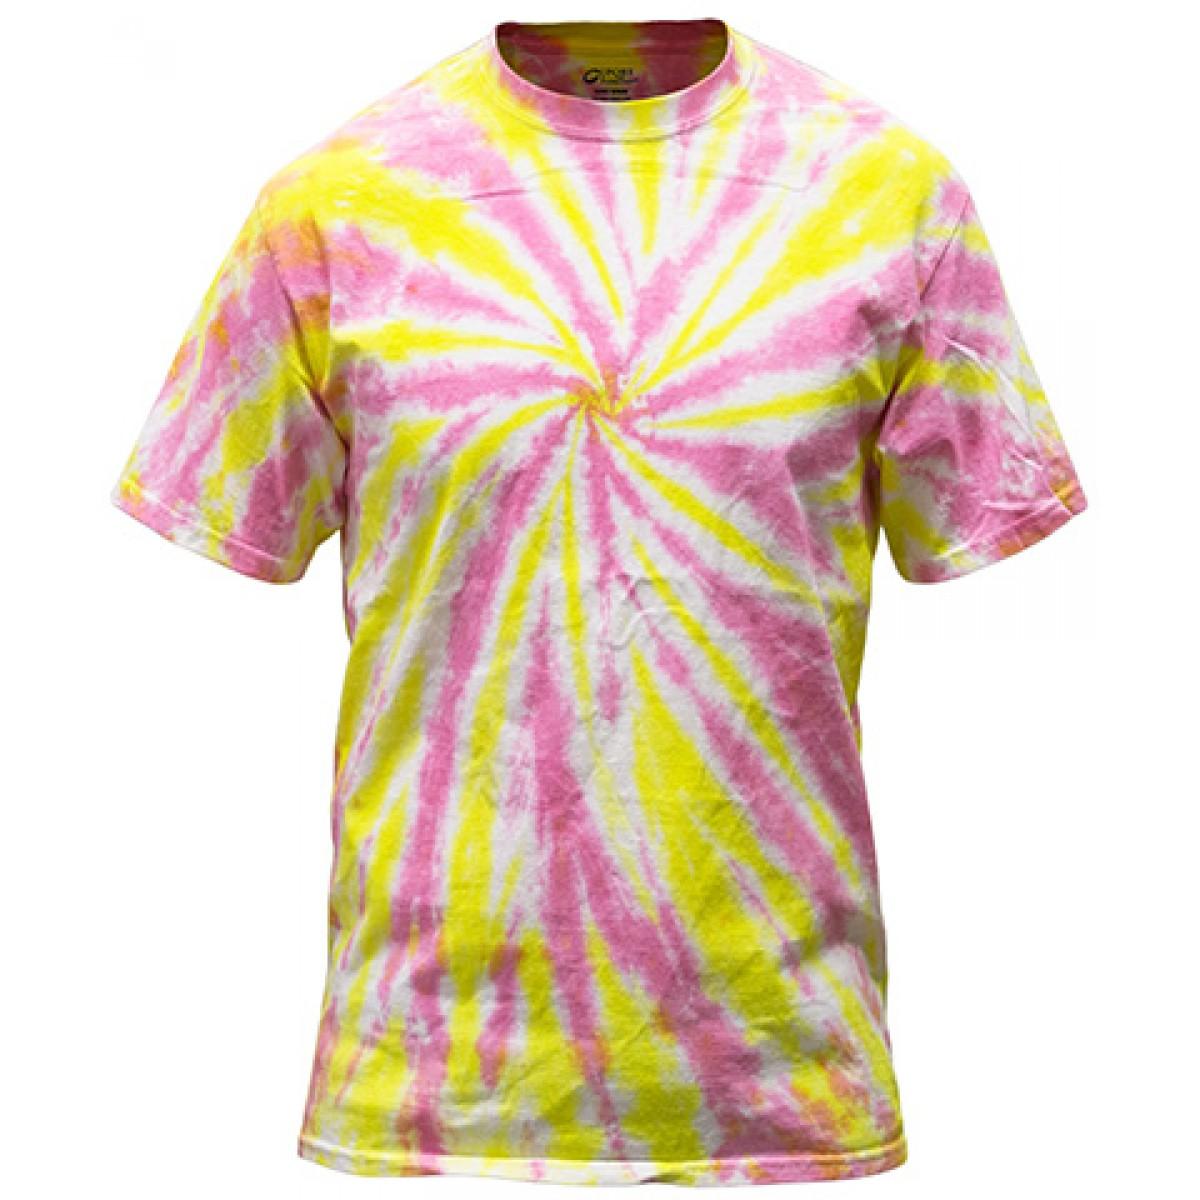 Multi-Color Tie-Dye Tee -Pink/Yellow-XL